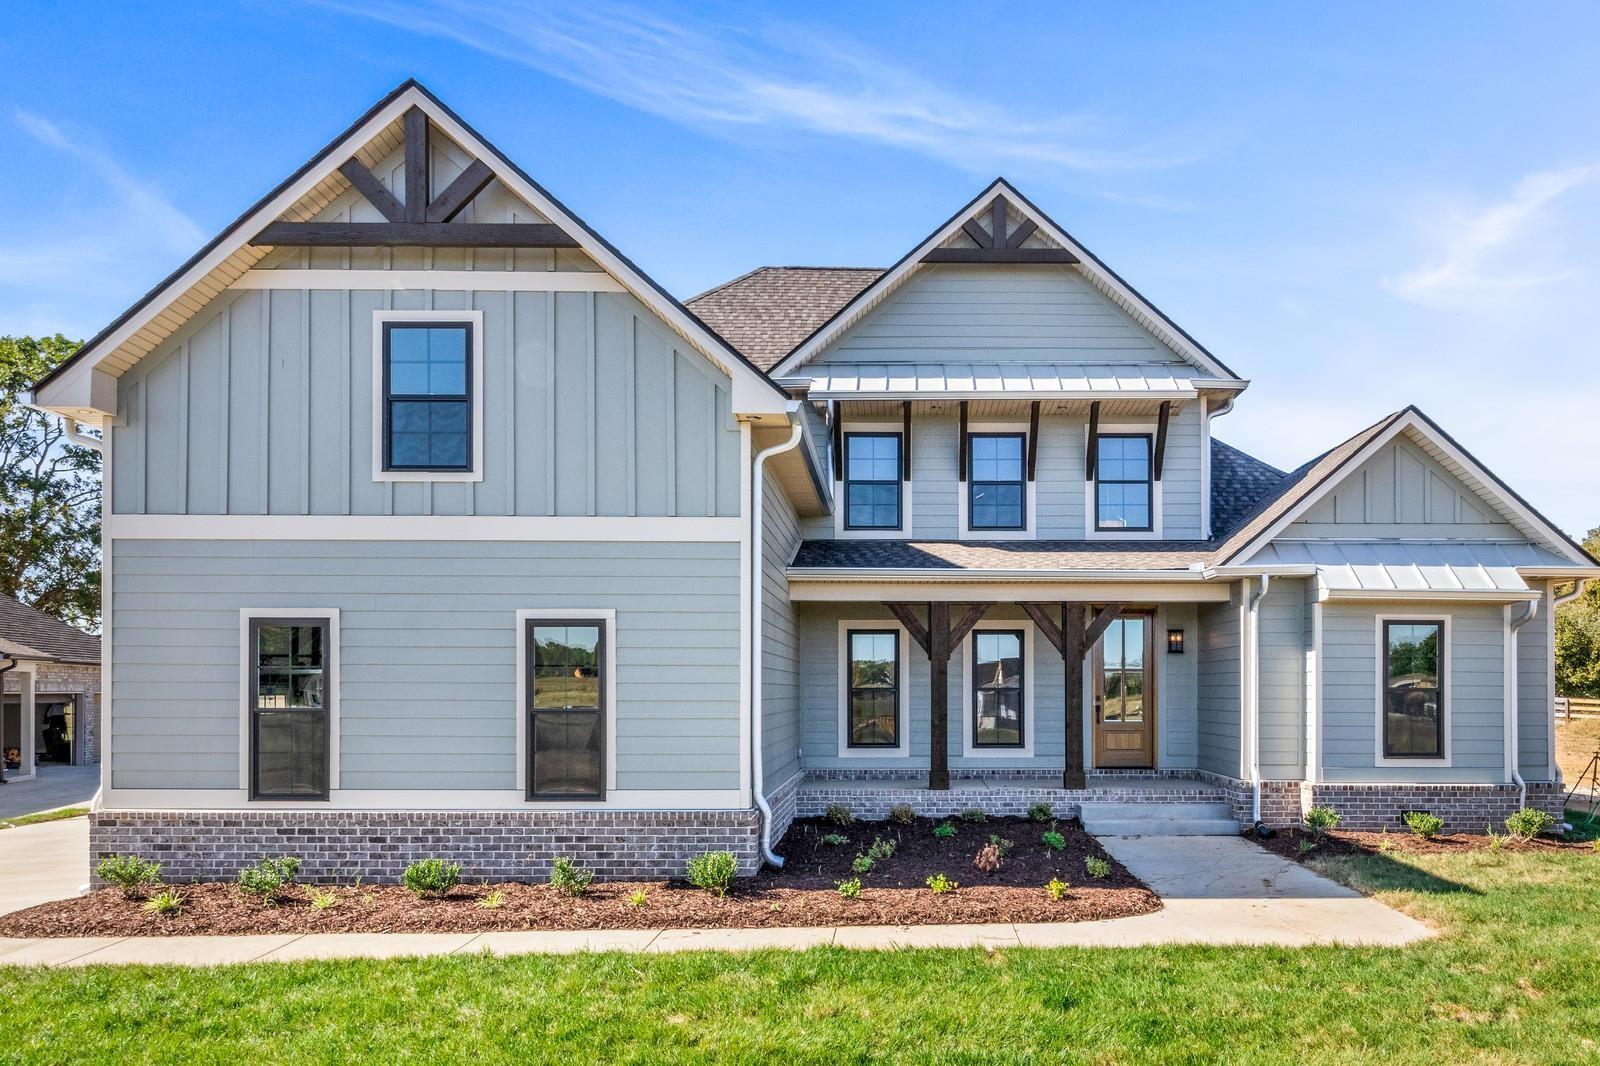 412 Shea's Way , Clarksville, TN 37043 - Clarksville, TN real estate listing